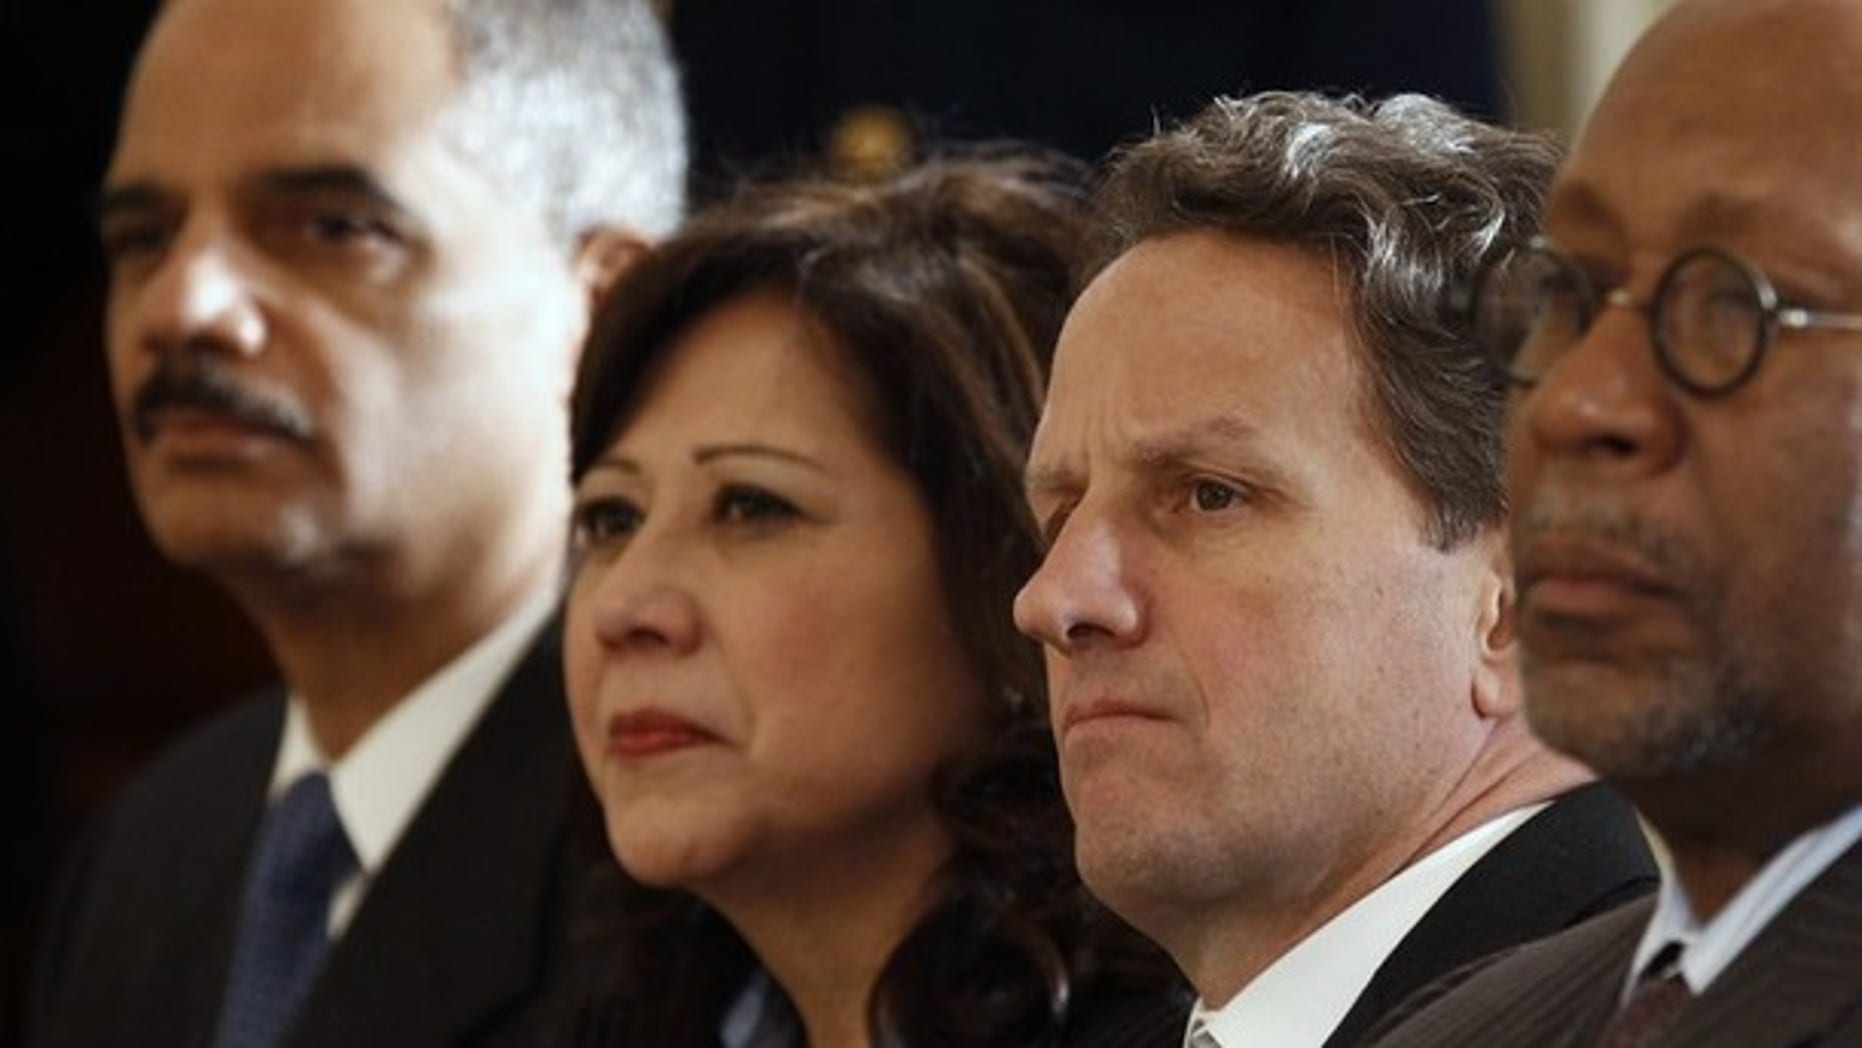 Attorney General Eric Holder, Labor Secretary Hilda Solis, Treasury Secretary Tim Geithner and U.S. Trade Representative Ron Kirk in Washington January 24, 2011.  (Reuters)